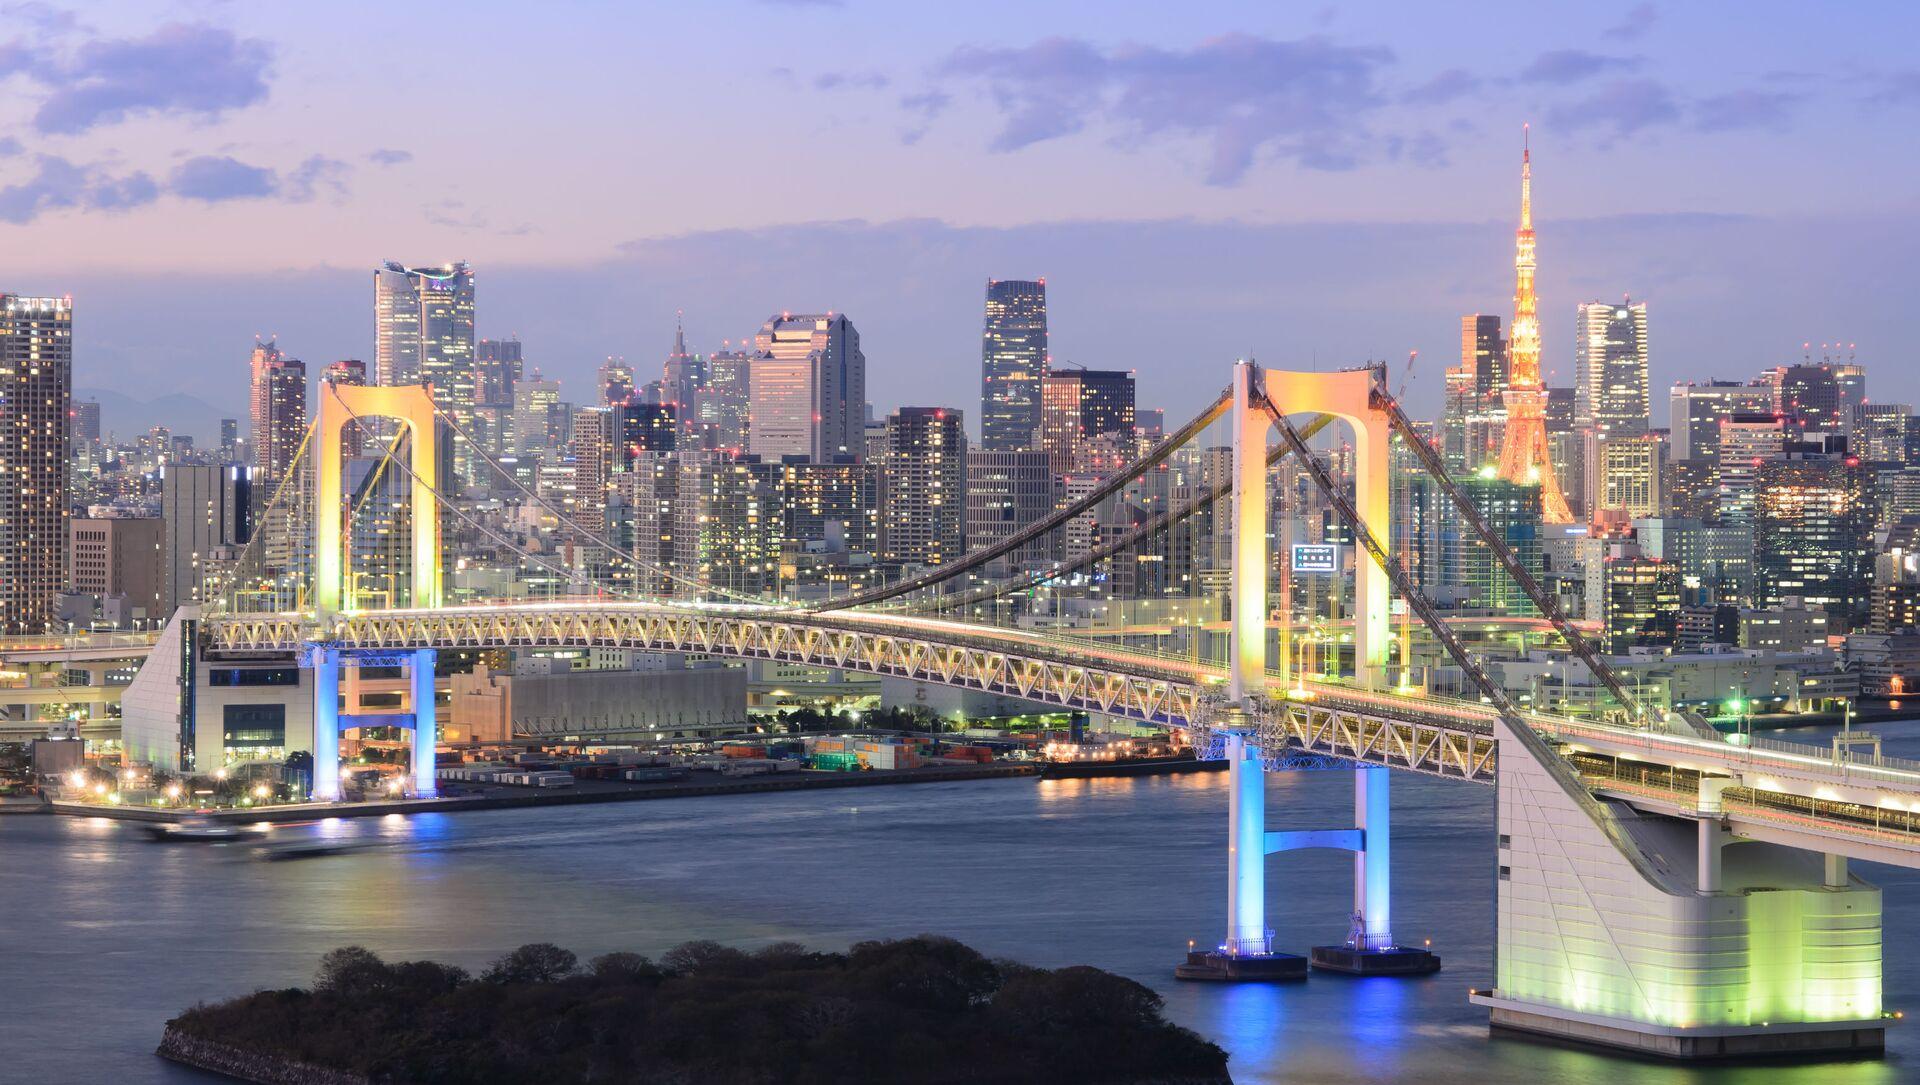 Tokio, Japonsko - Sputnik Česká republika, 1920, 13.02.2021